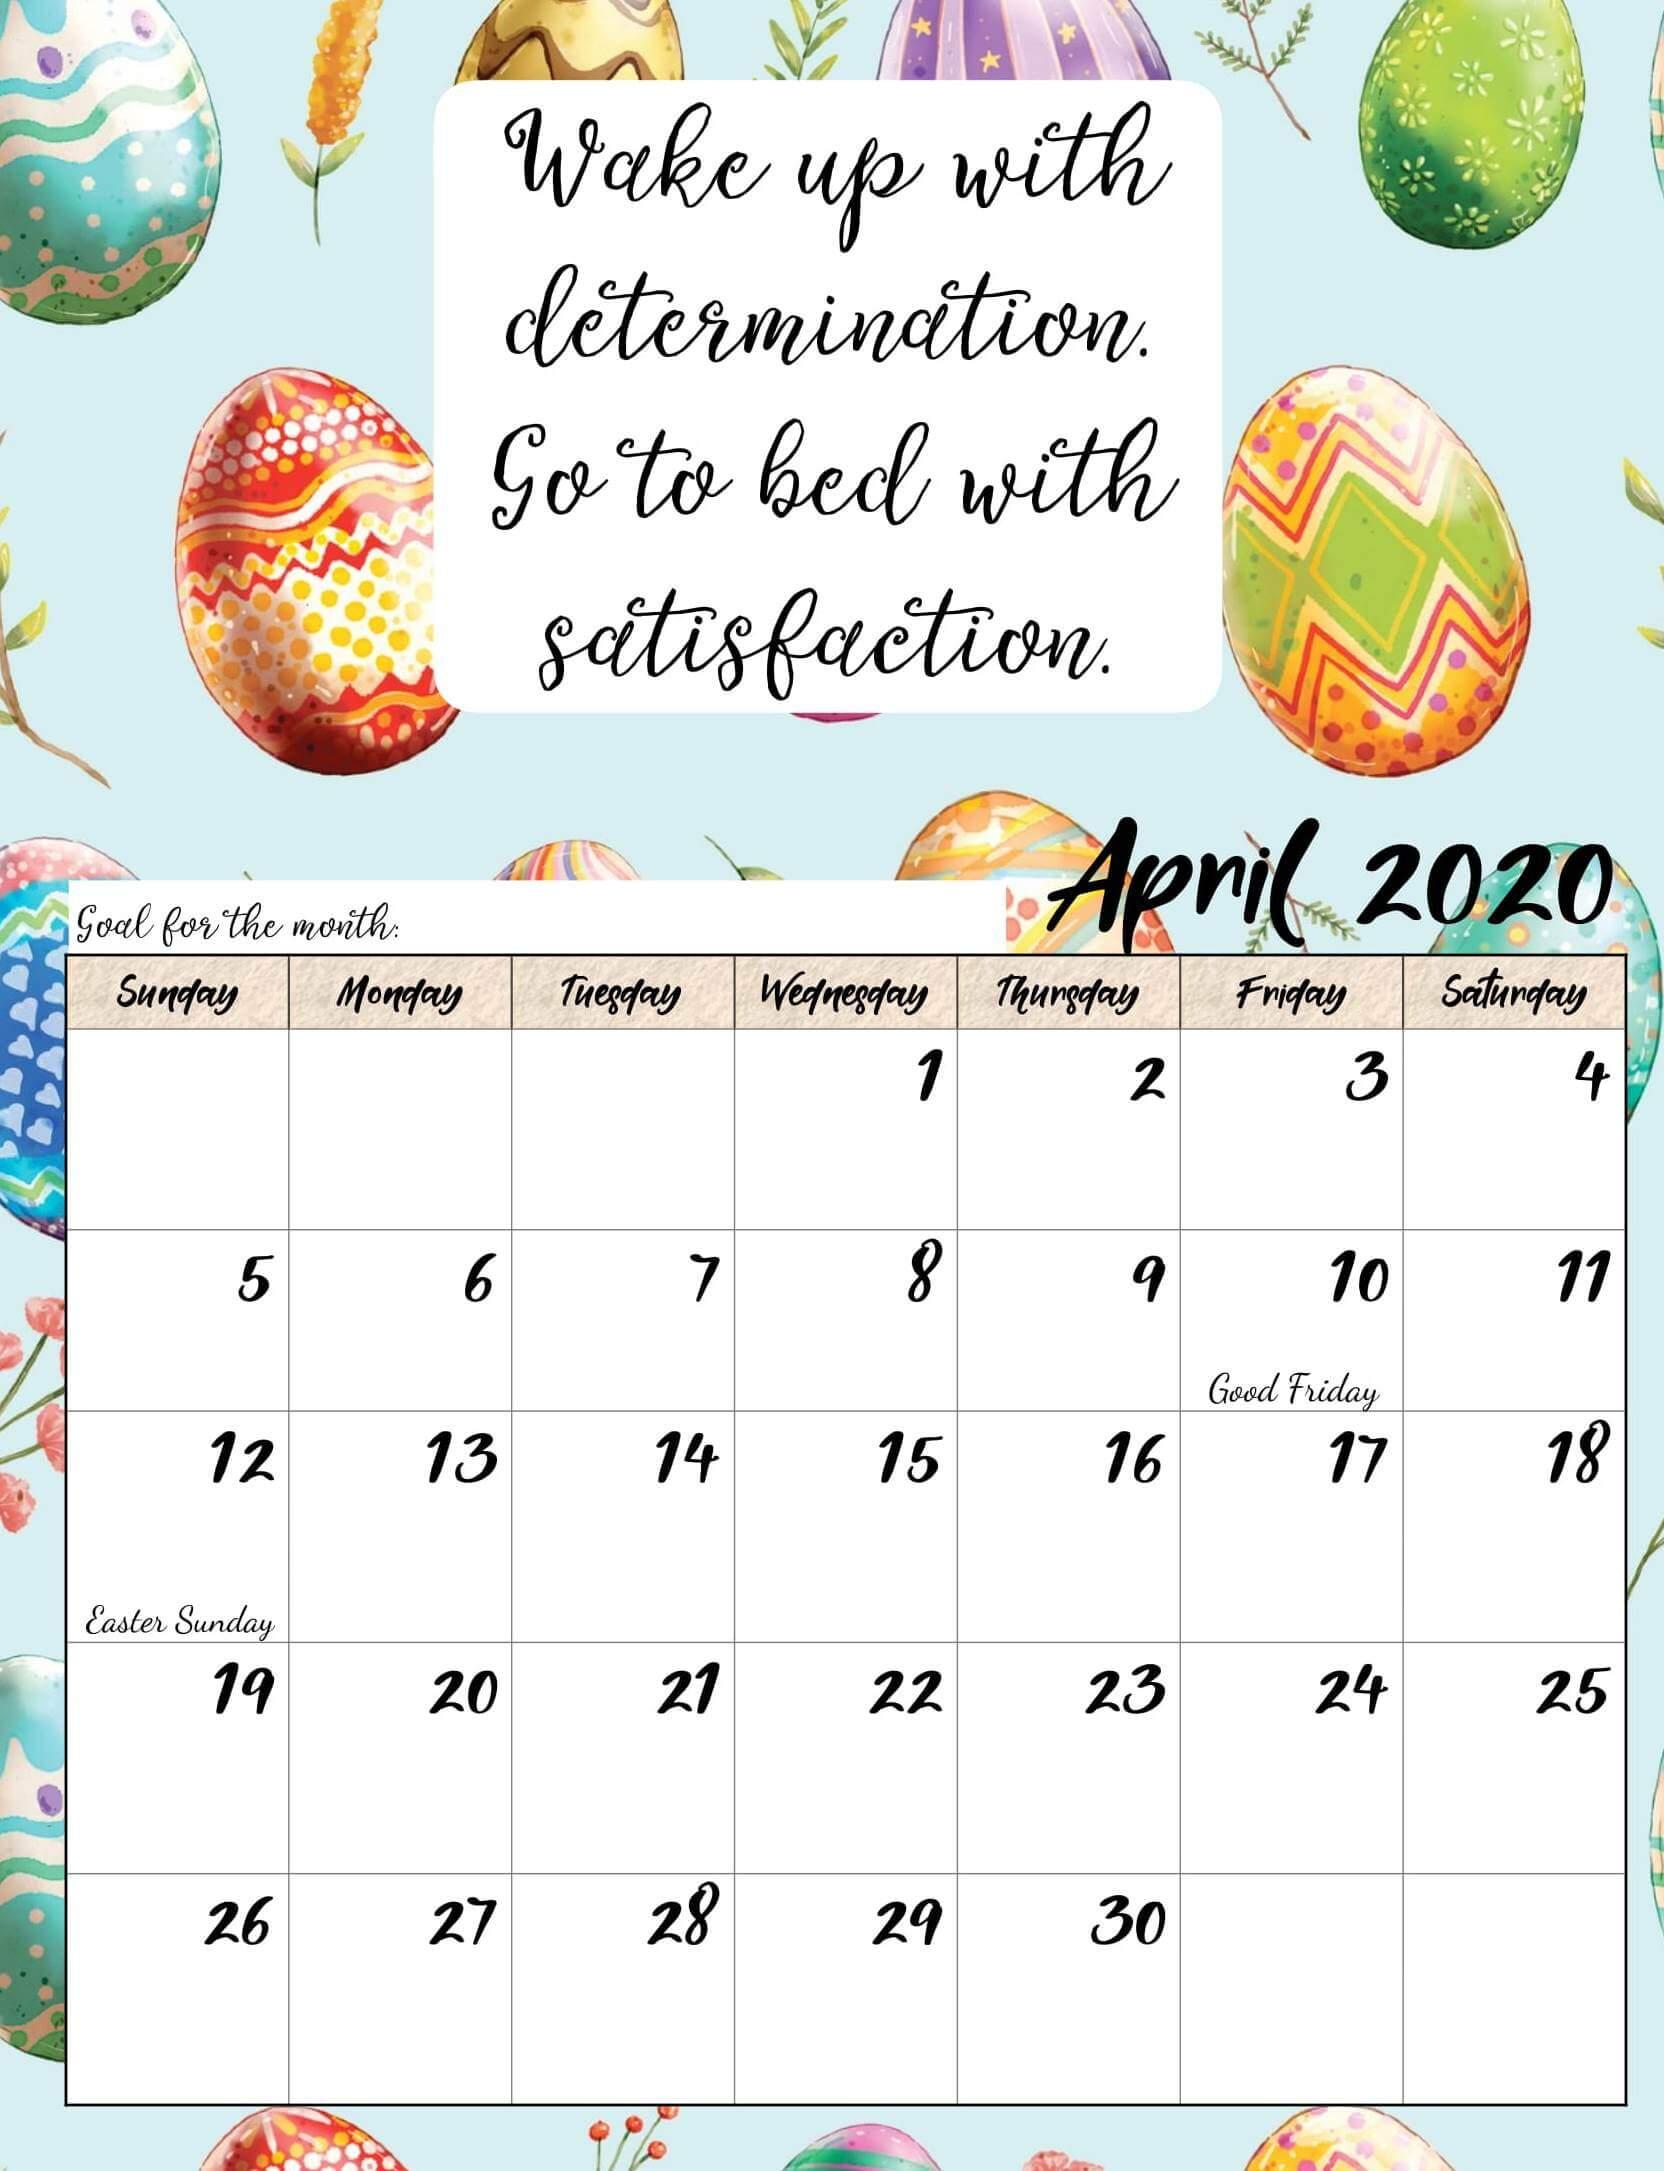 Cute April 2020 Calendar For Kids